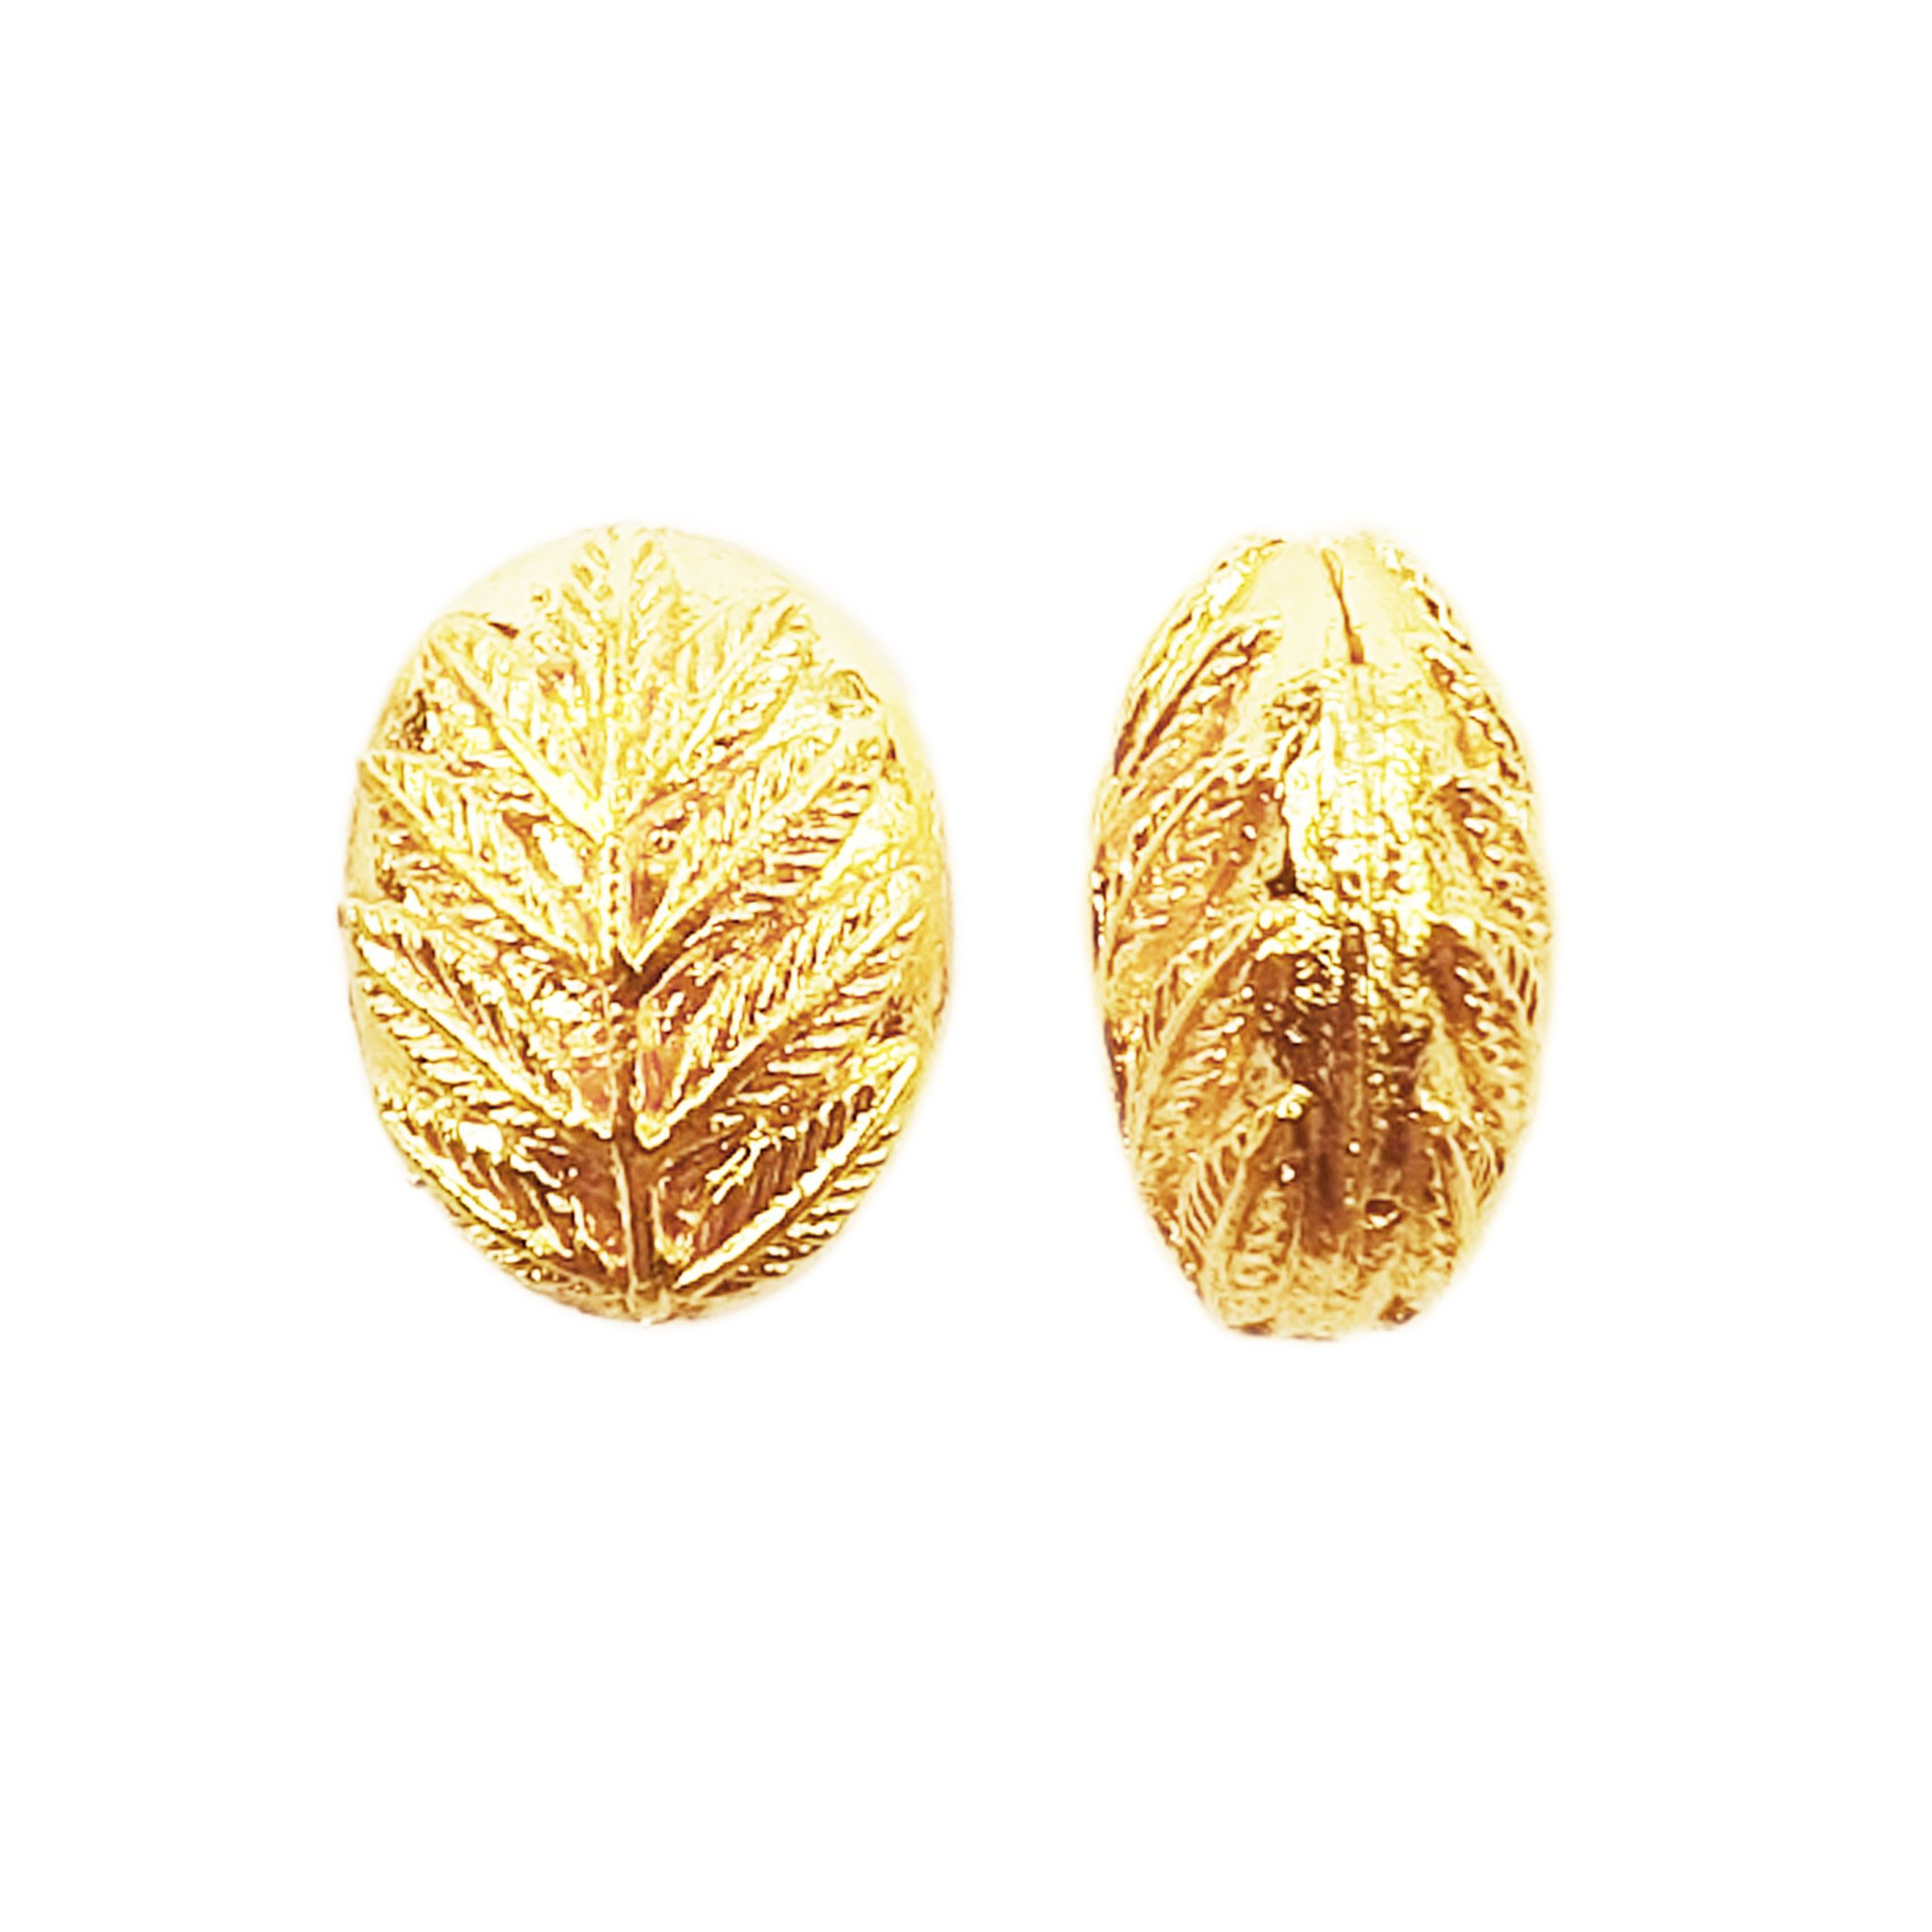 BG-129 18K Gold Overlay Bali Bead